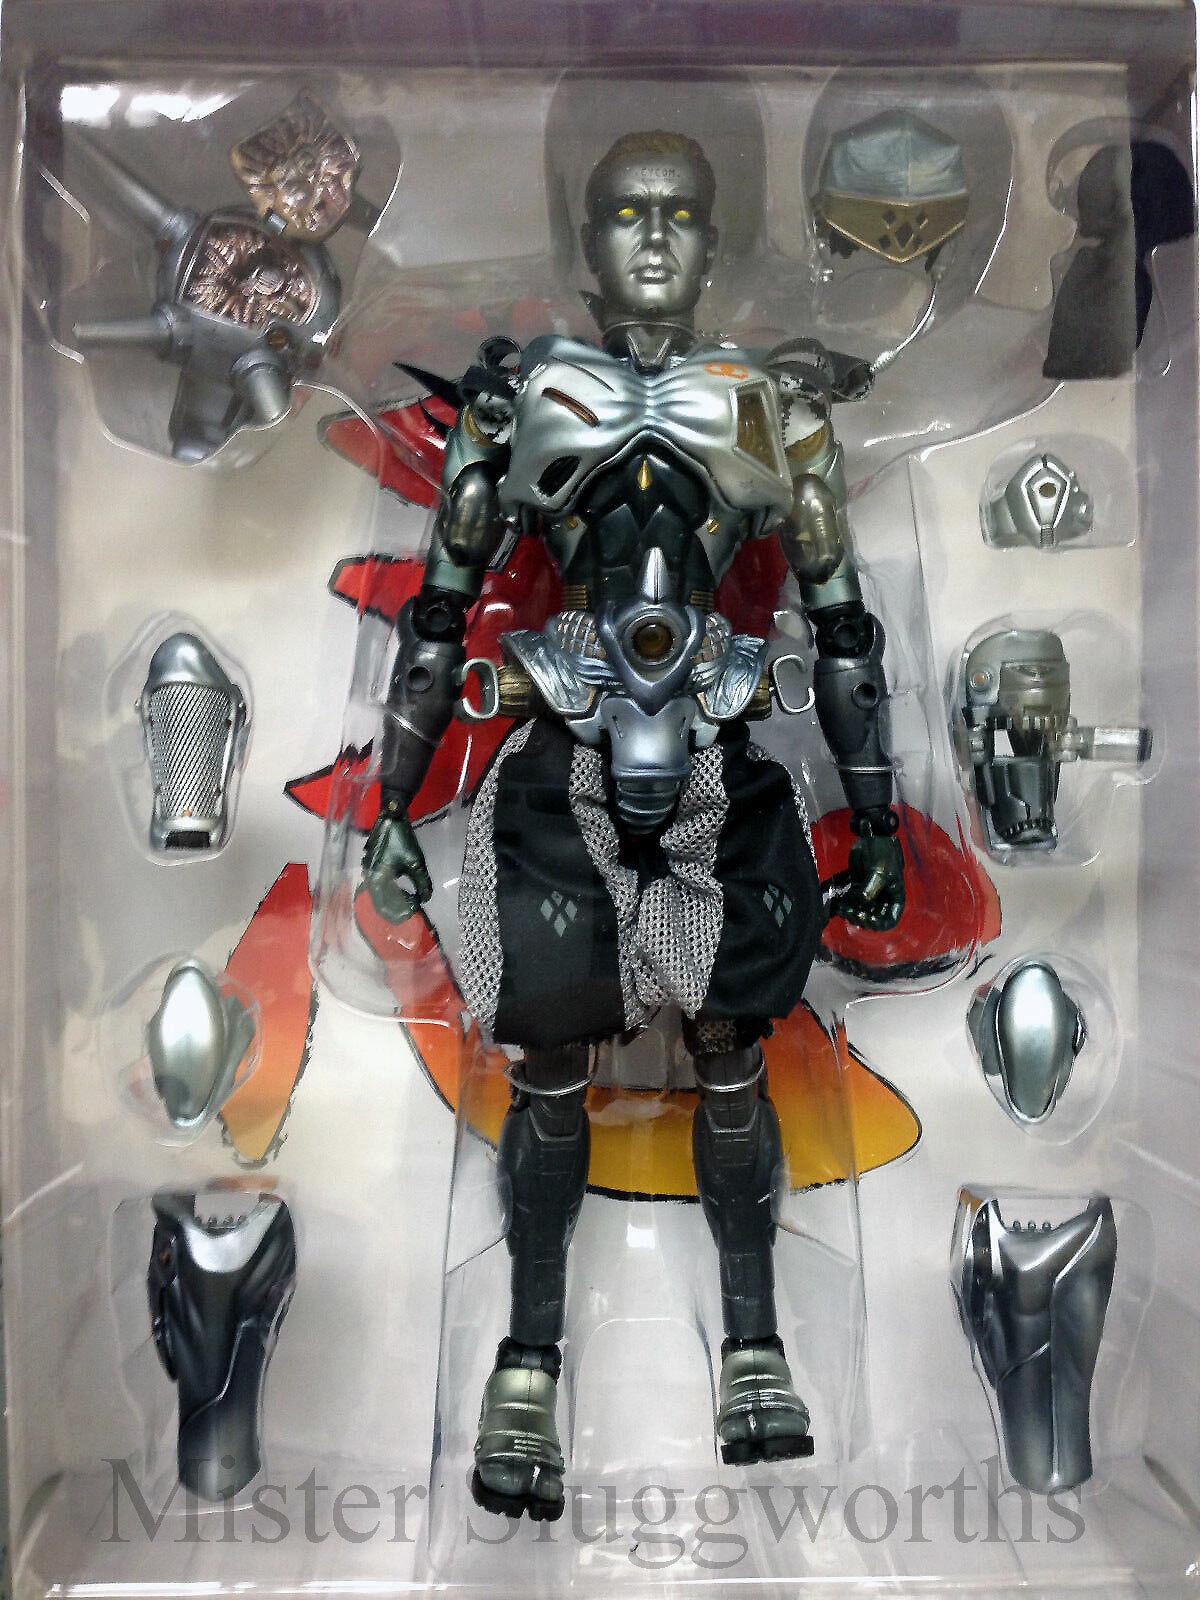 bluee Box BBi 1 6 Cy Com Series Spectre GI Joe Henshin Ninja Assassin MIB Rare